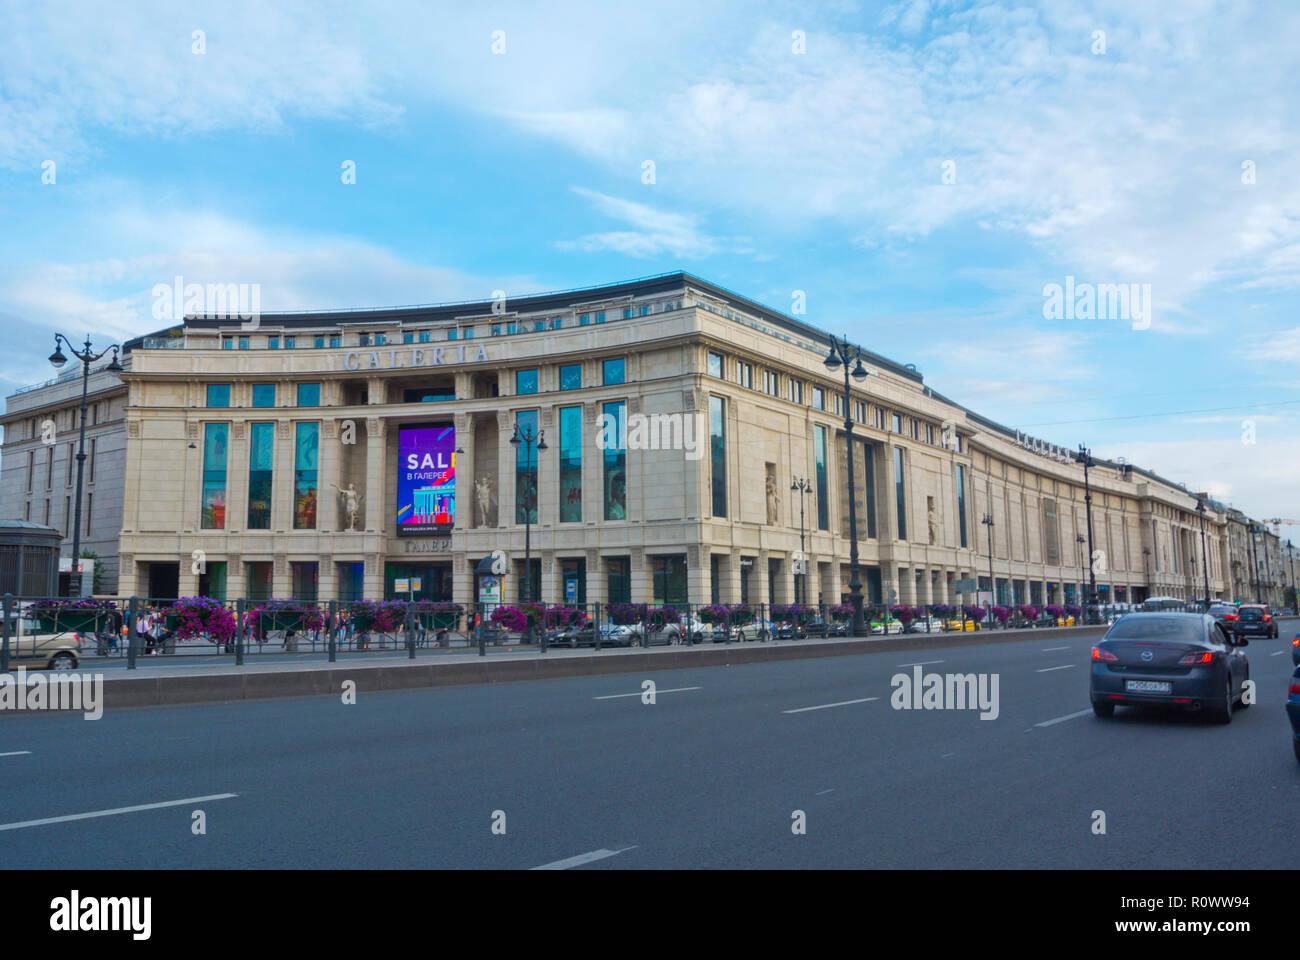 Ligovsky avenue, at pl Vosstaniya, with Galeria shopping mall, Saint Petersburg, Russia - Stock Image